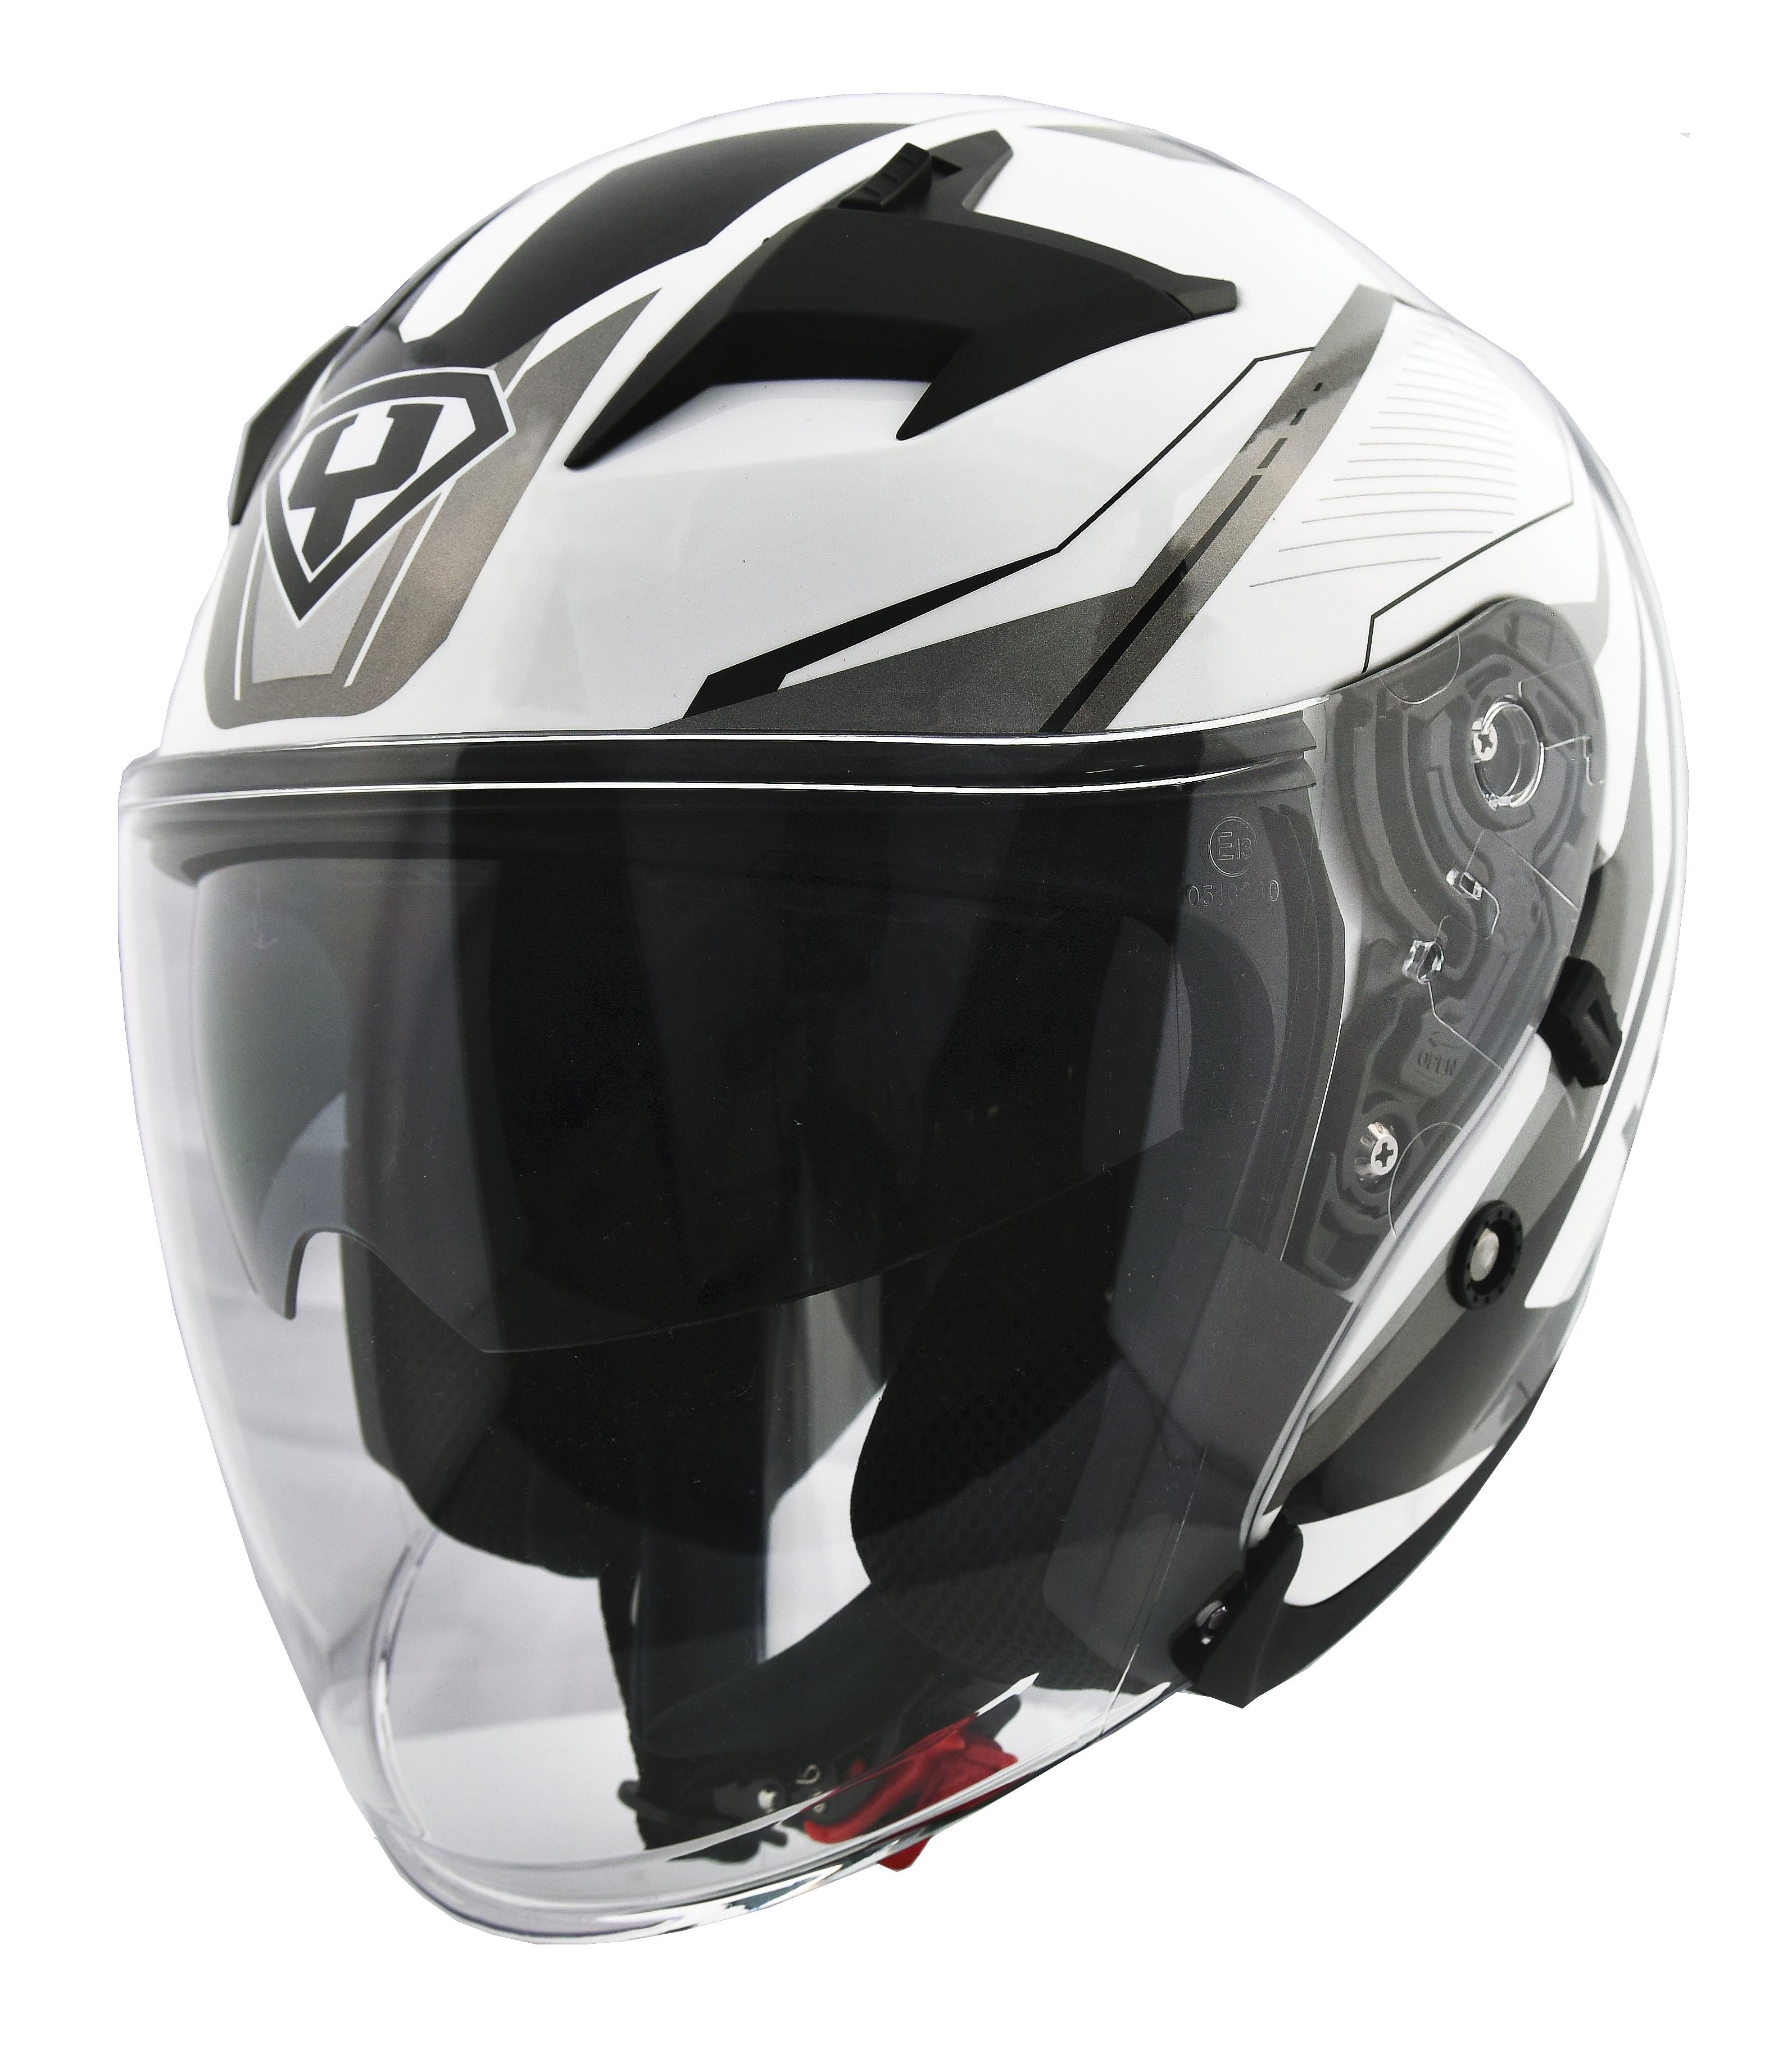 Moto helma Yohe 878-1M Graphic bílá